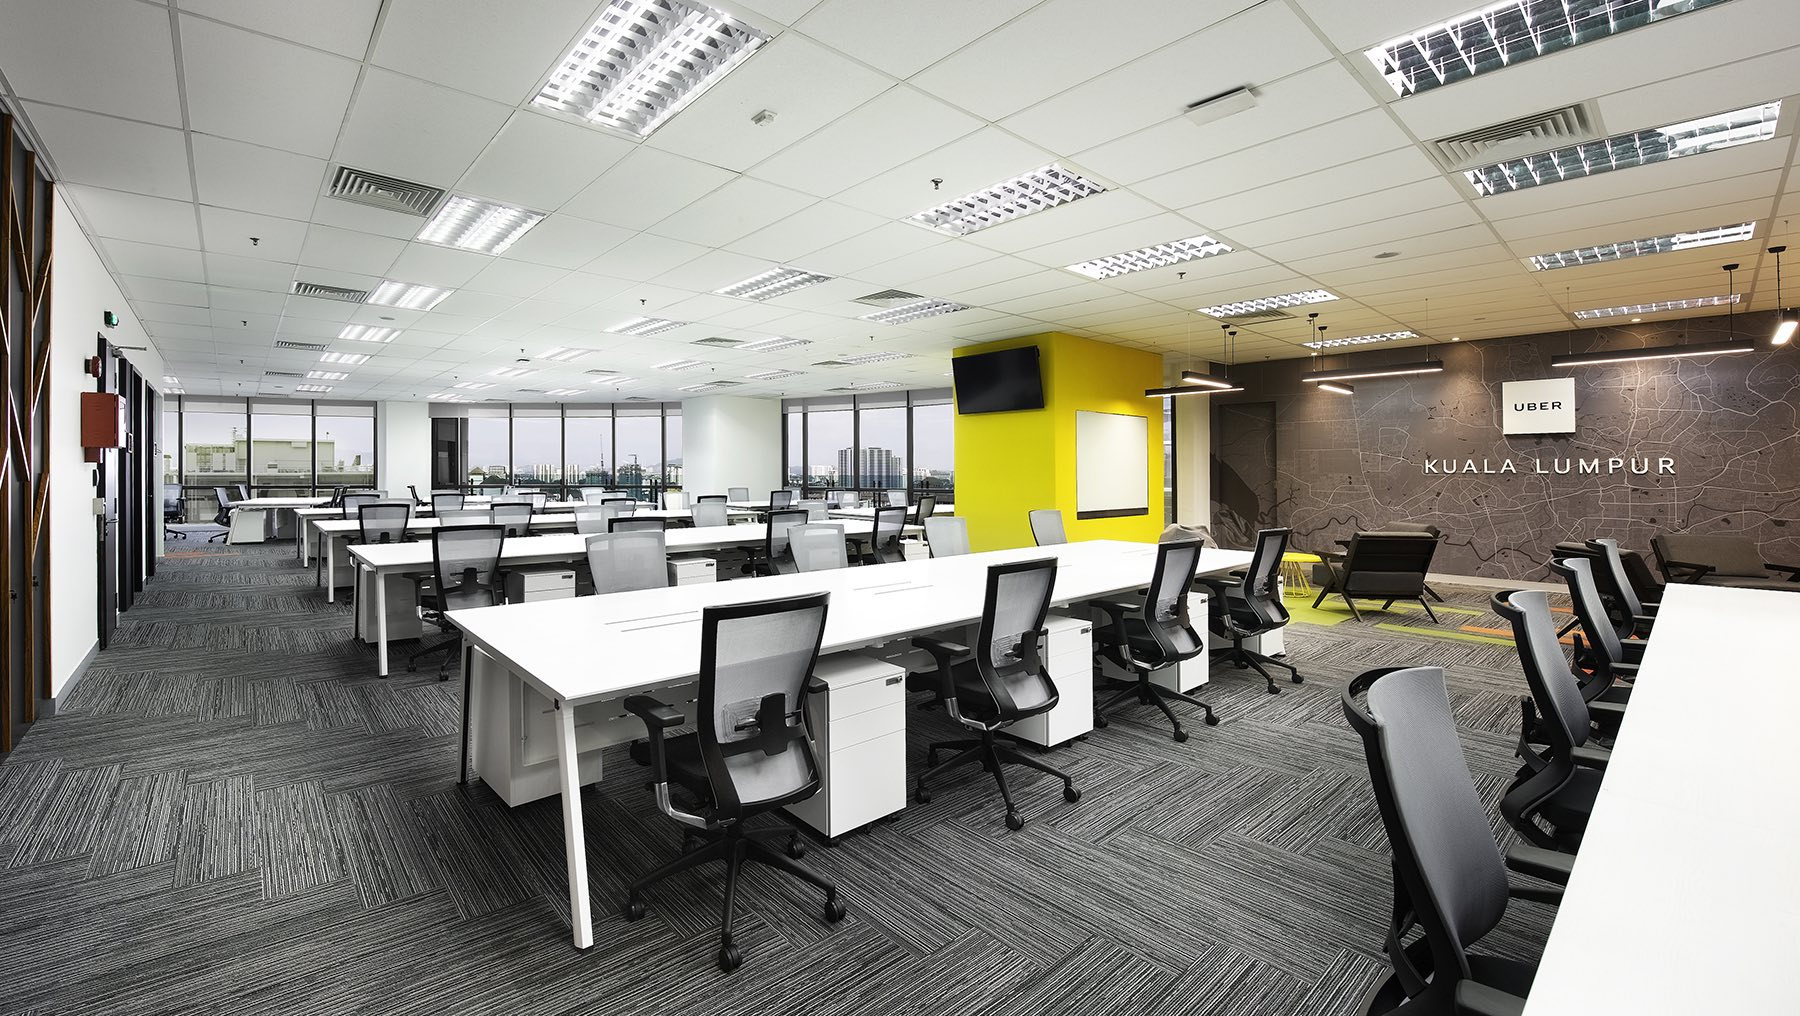 uber-kuala-lumpur-office-5